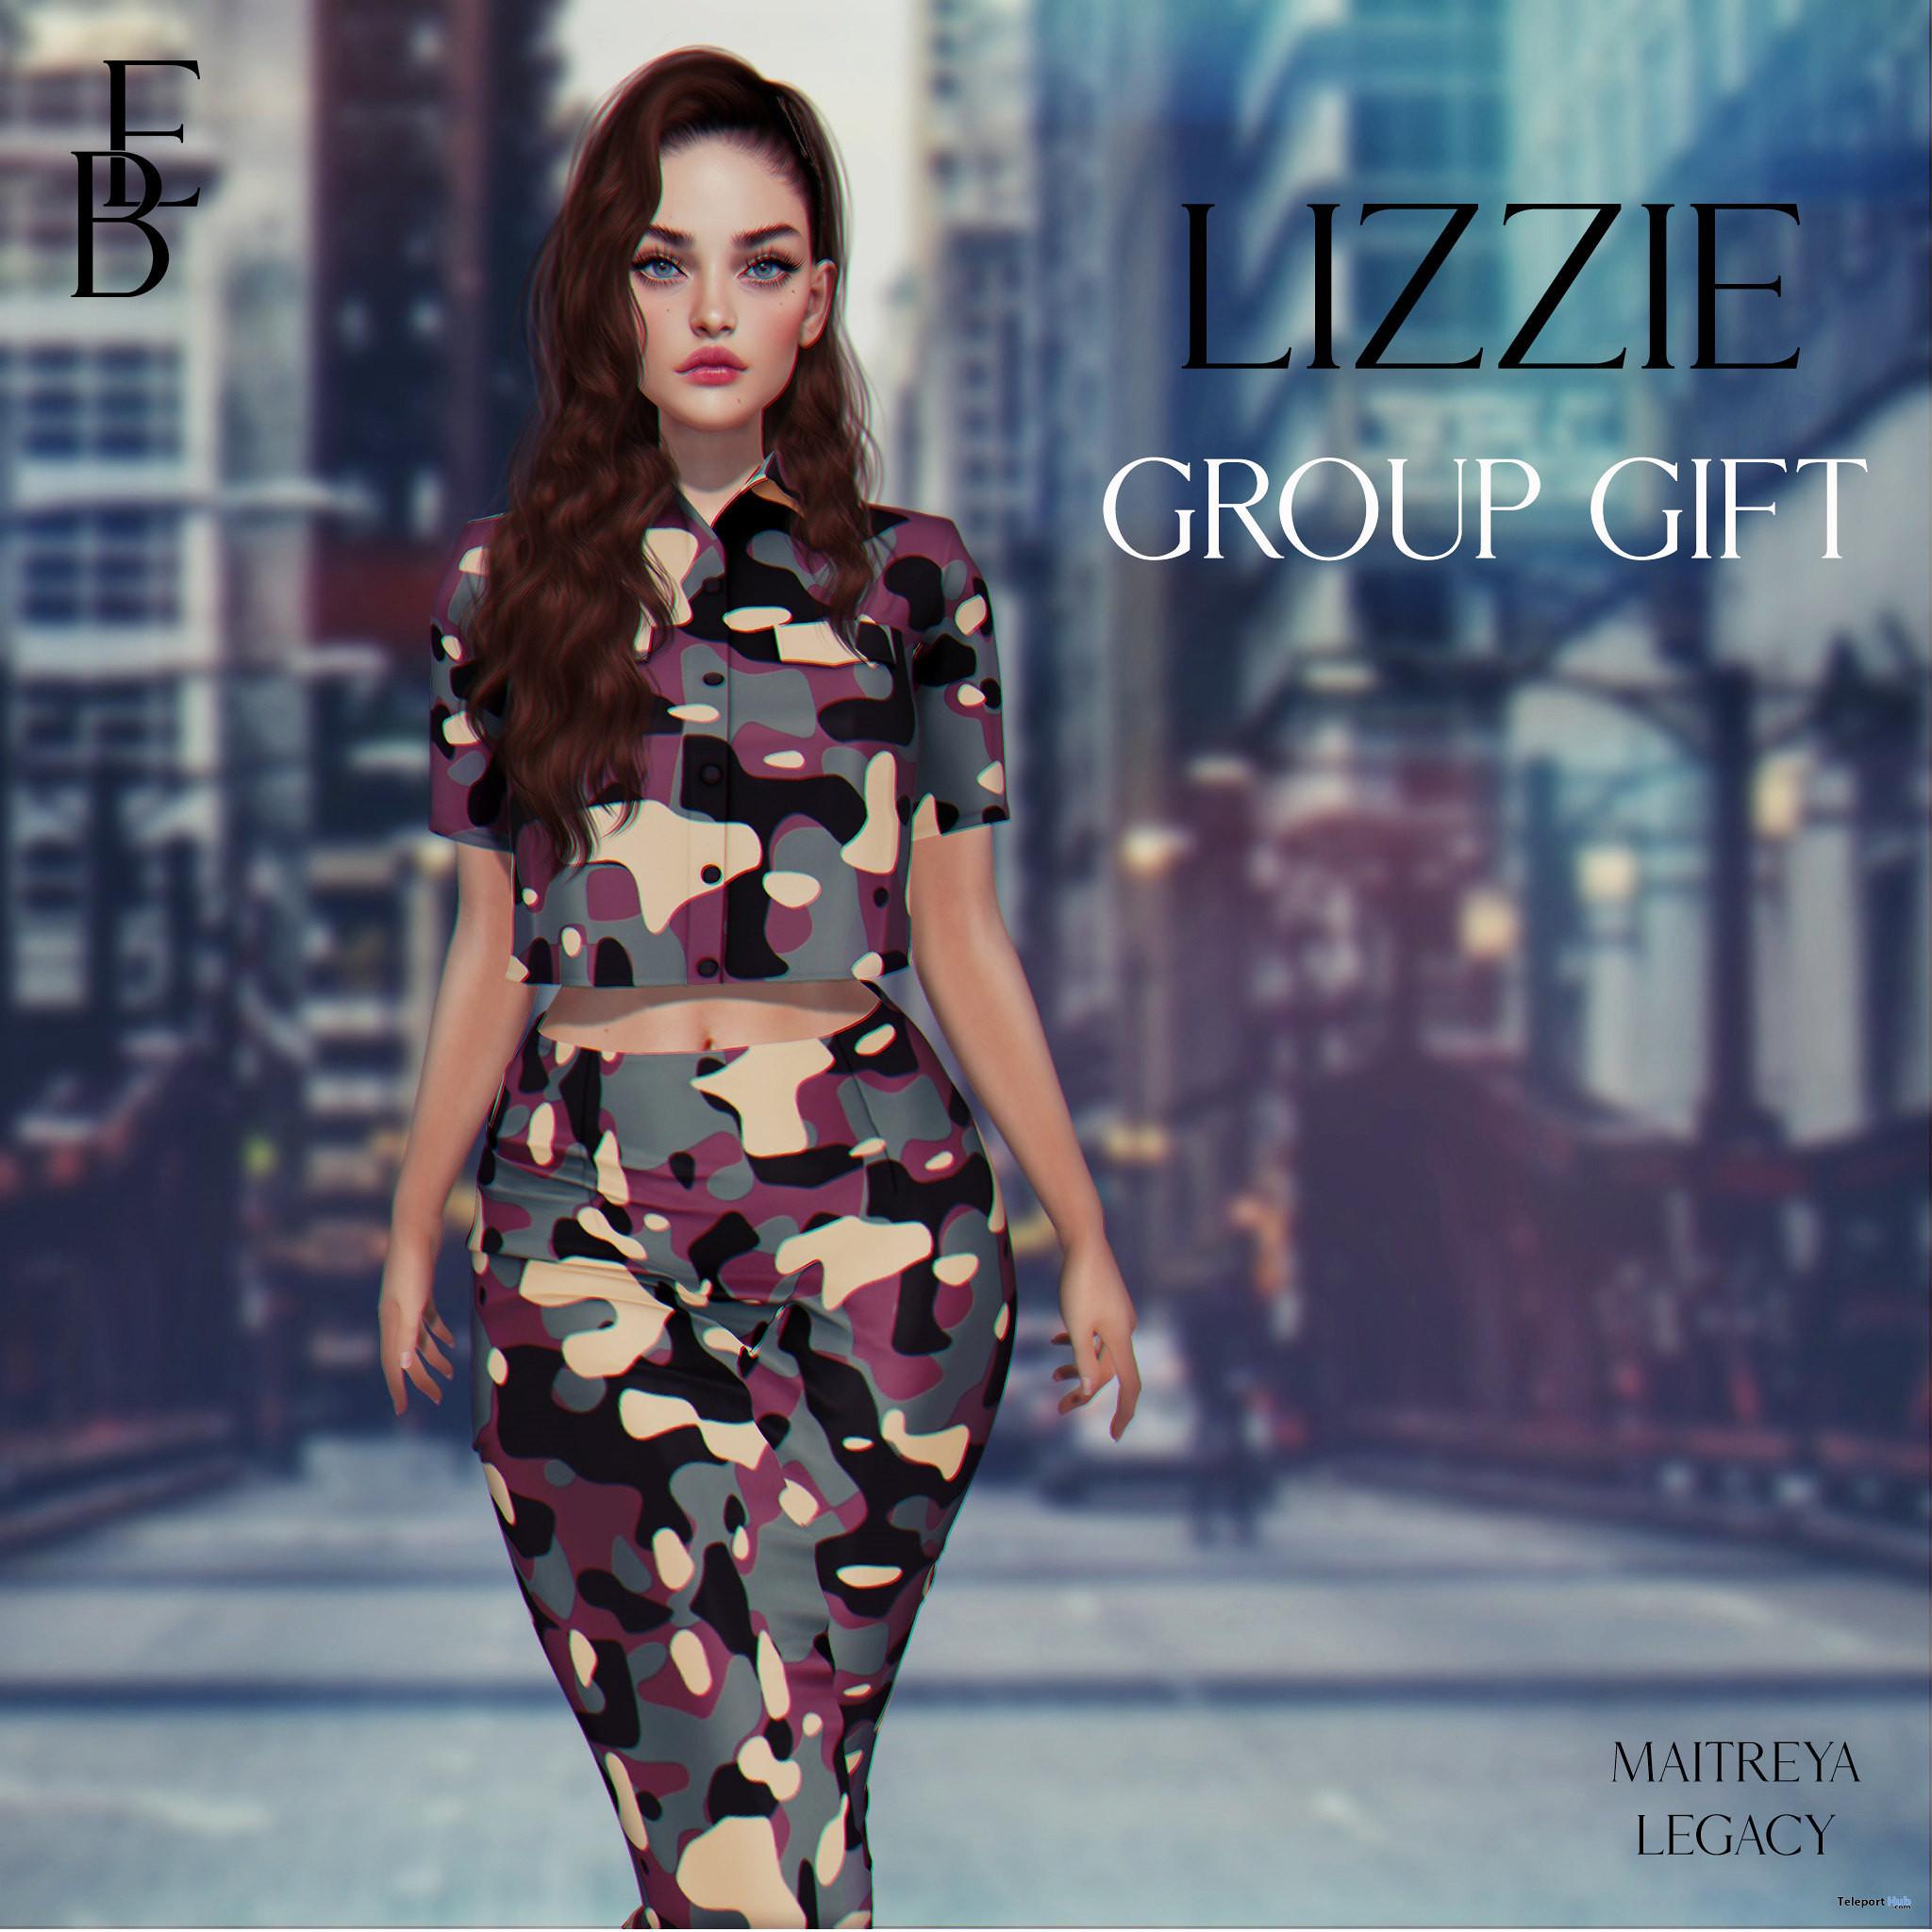 Lizzie Dress September 2021 Group Gift by Belle Epoque - Teleport Hub - teleporthub.com